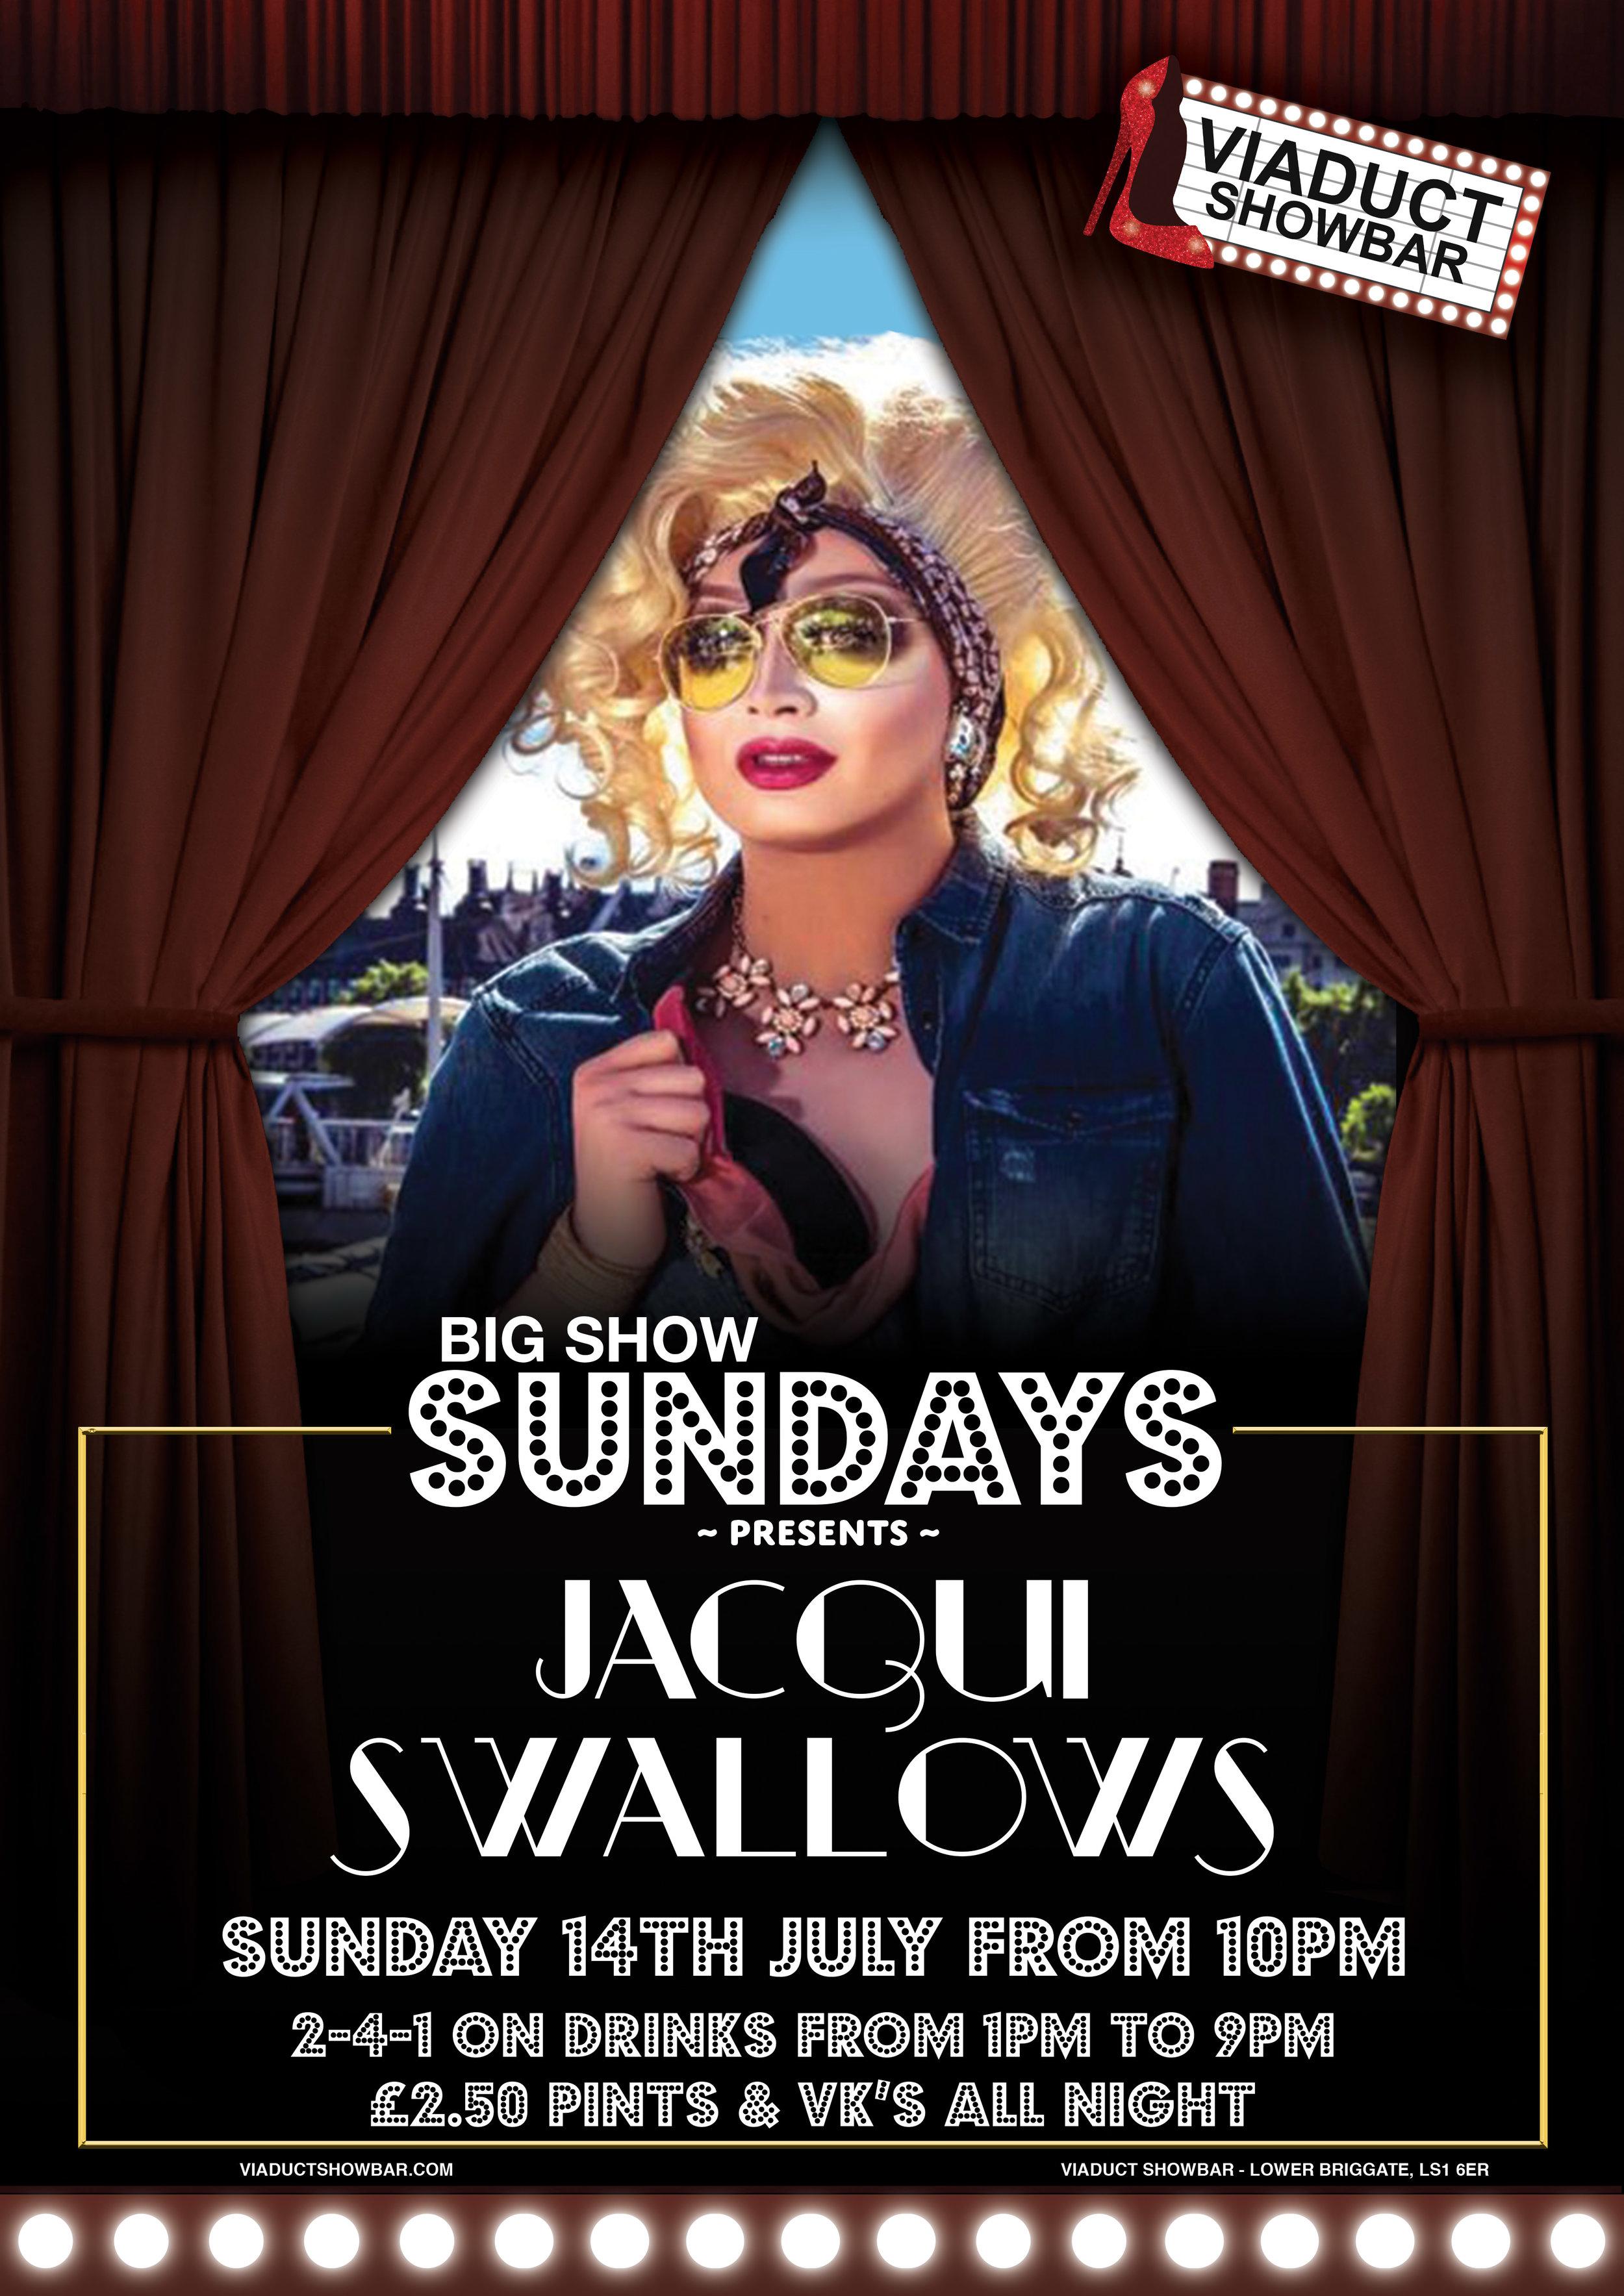 WEB-Big-Show-Sundays-Jaquie-swallows.jpg